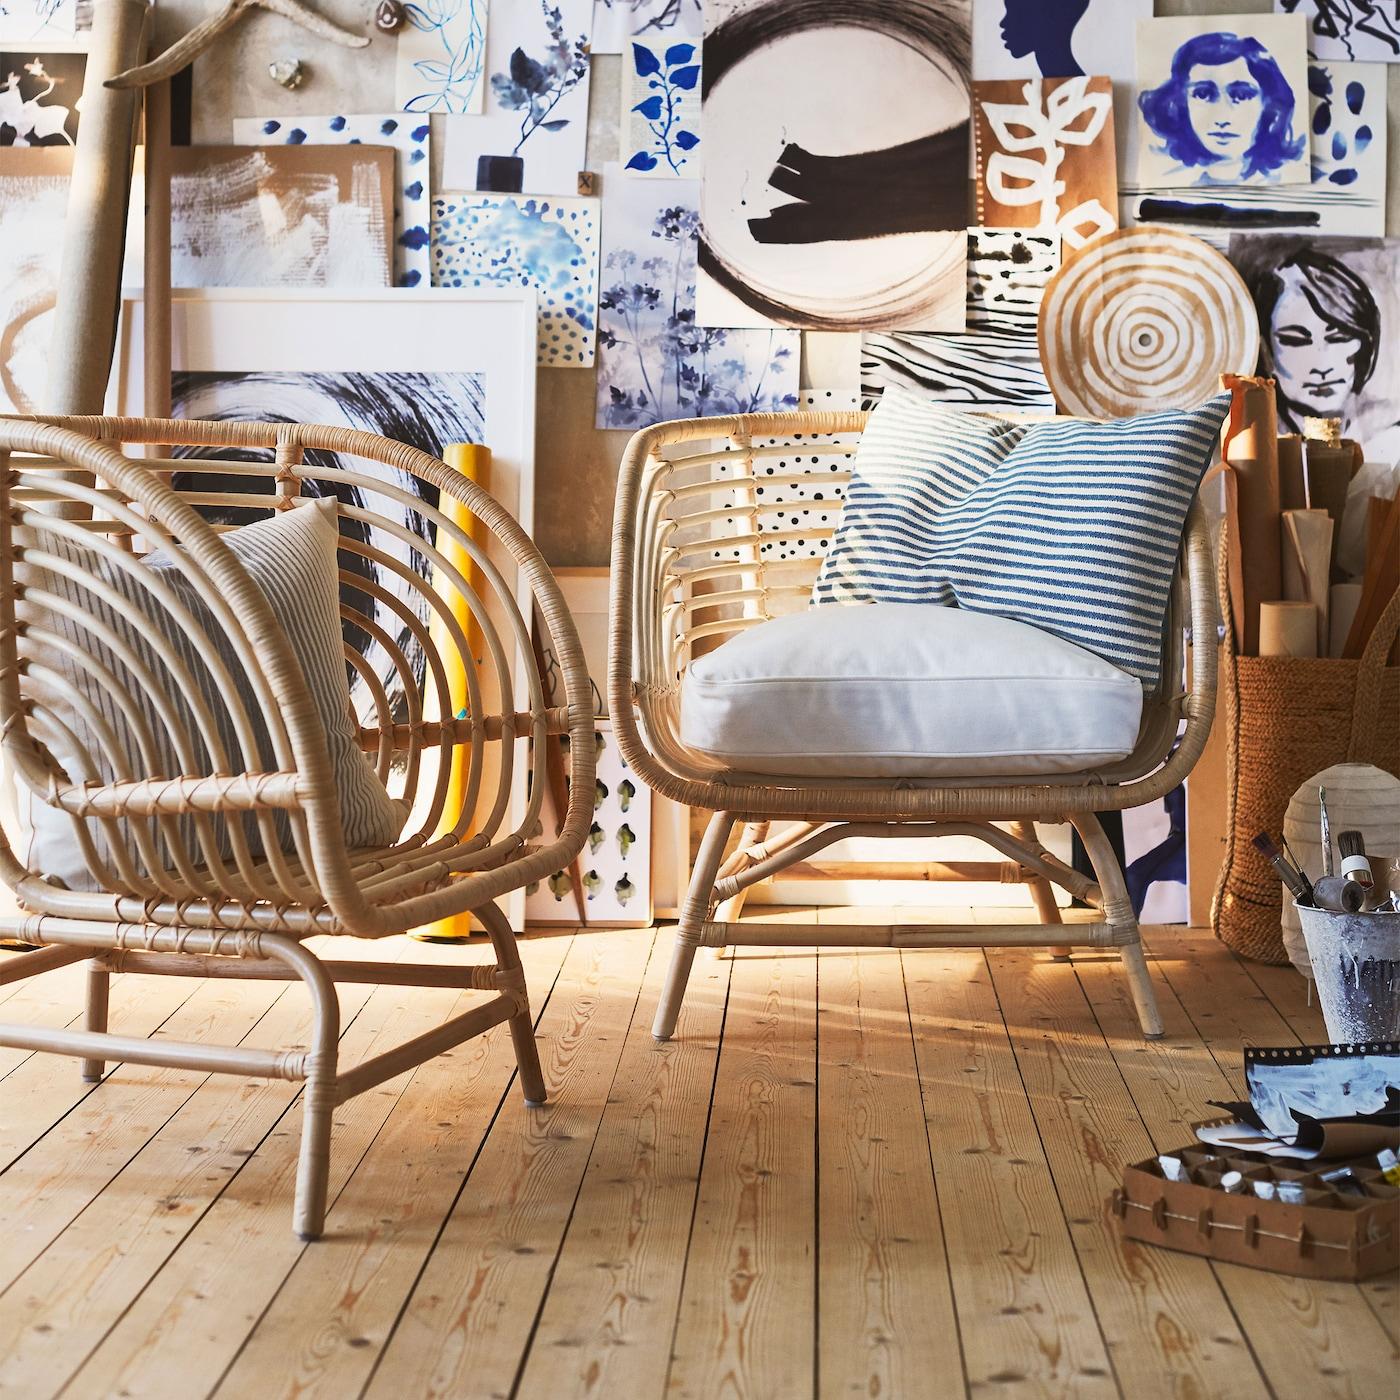 BUSKBO 布克伯 扶手椅采用藤条手工编织而成,配有斗式风格座椅和四条低矮宽大的支腿,打造出自然、不拘一格的外观。